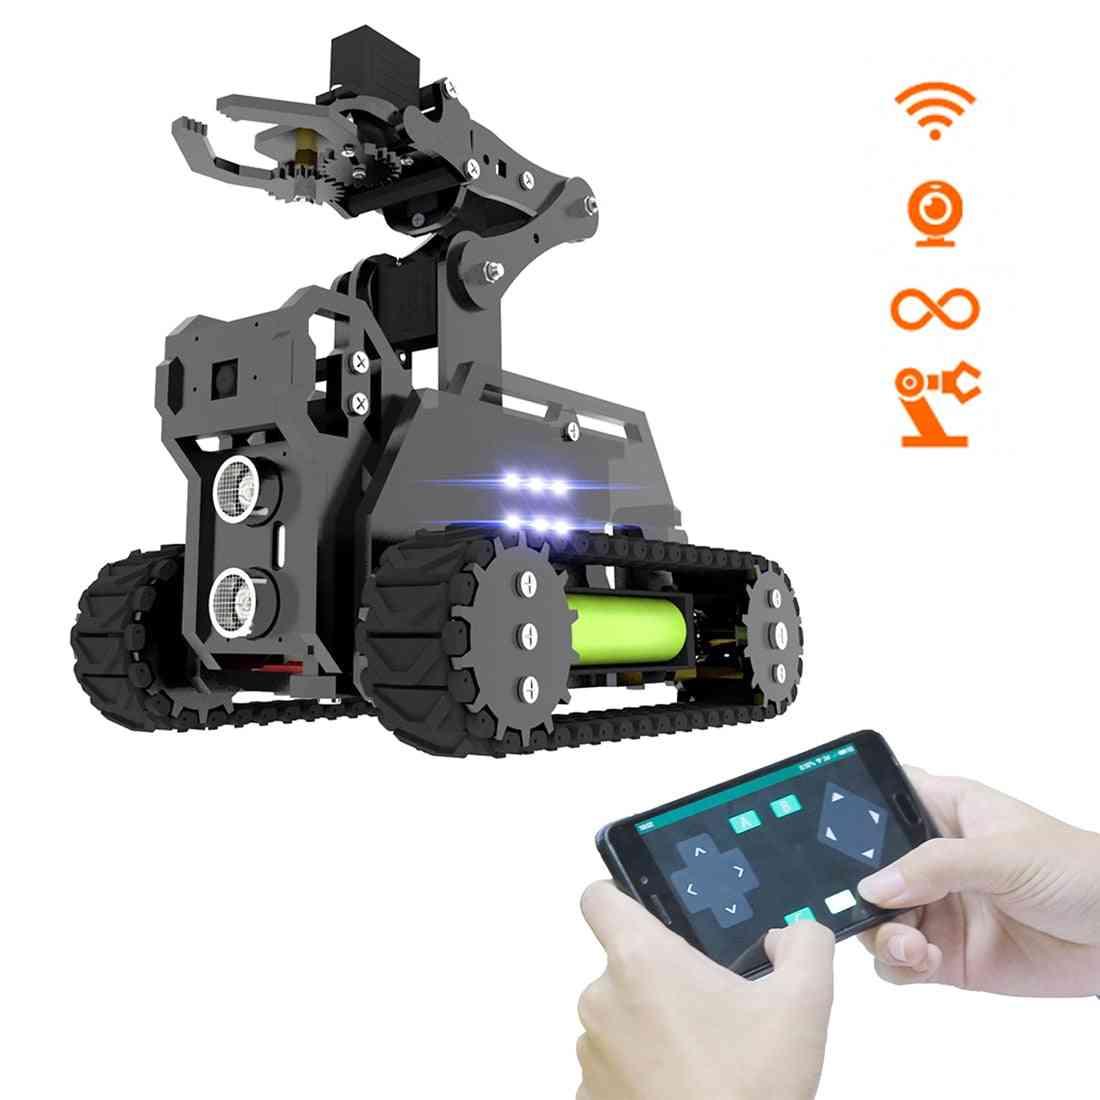 Wifi Wireless- Smart Robot Car Kit- Tank 4-dof Robotic Arm, Target Tracking, Video Transmission